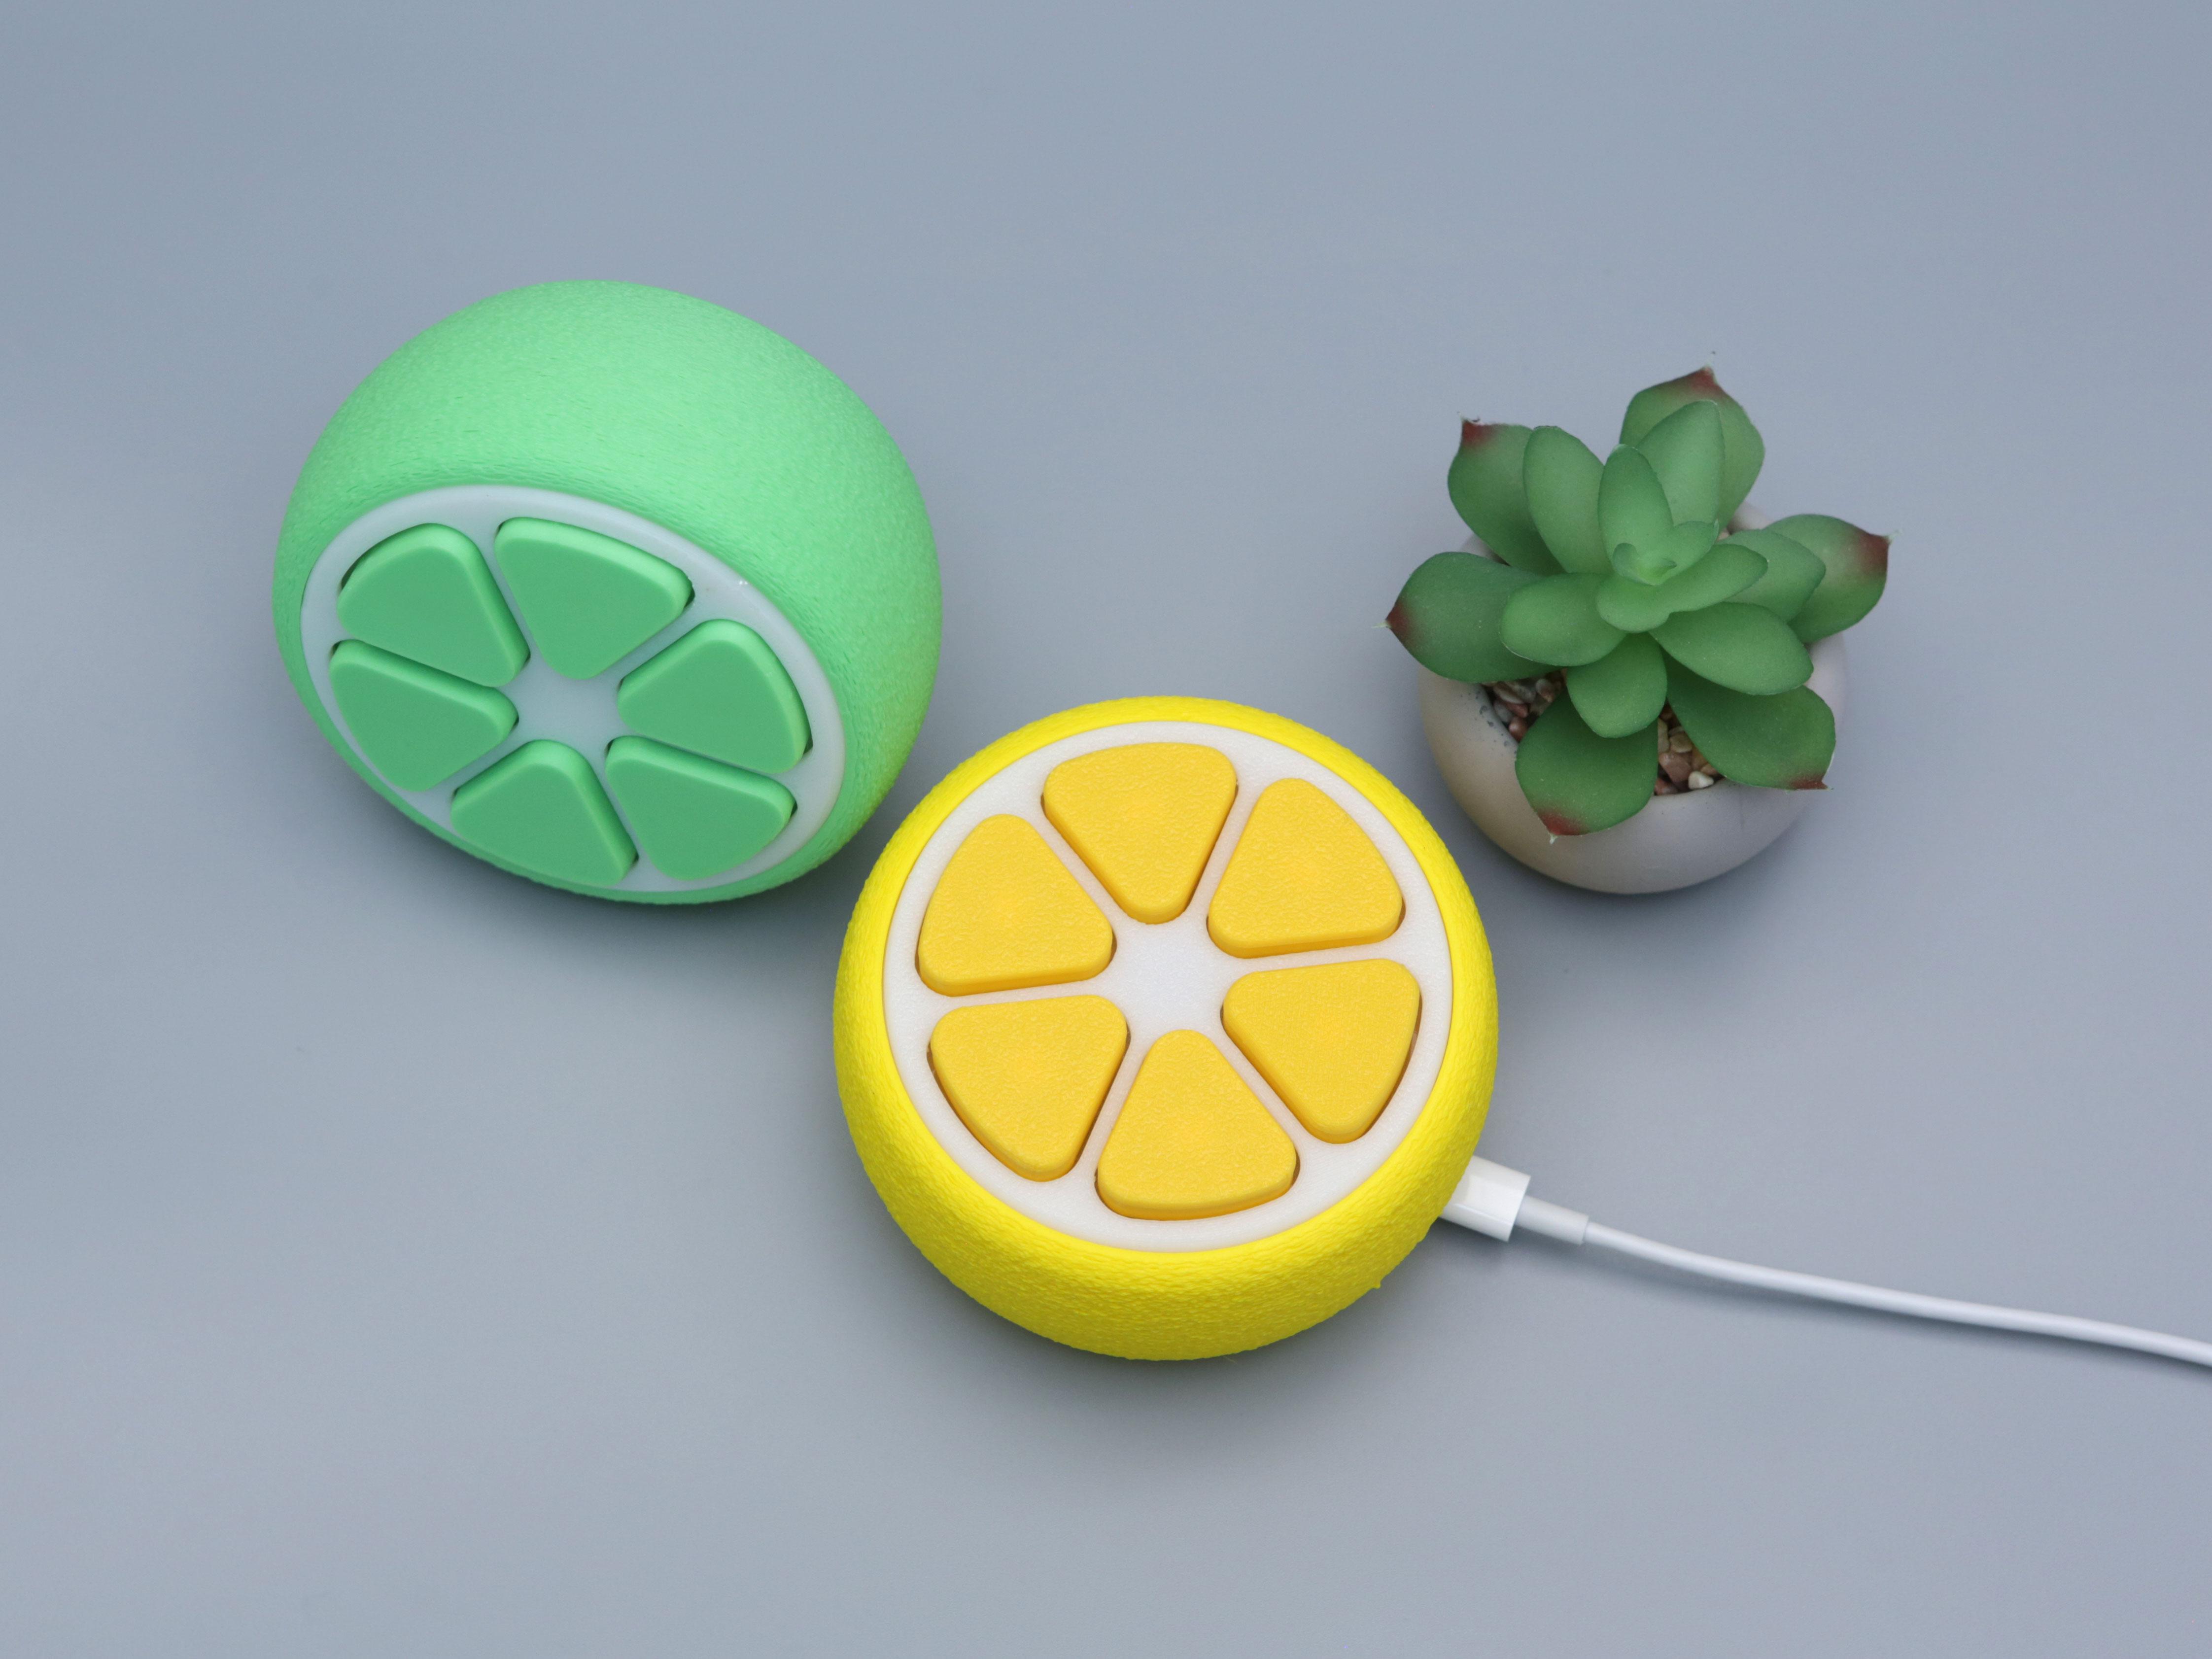 3d_printing_hero-lemon-lime-plant.jpg